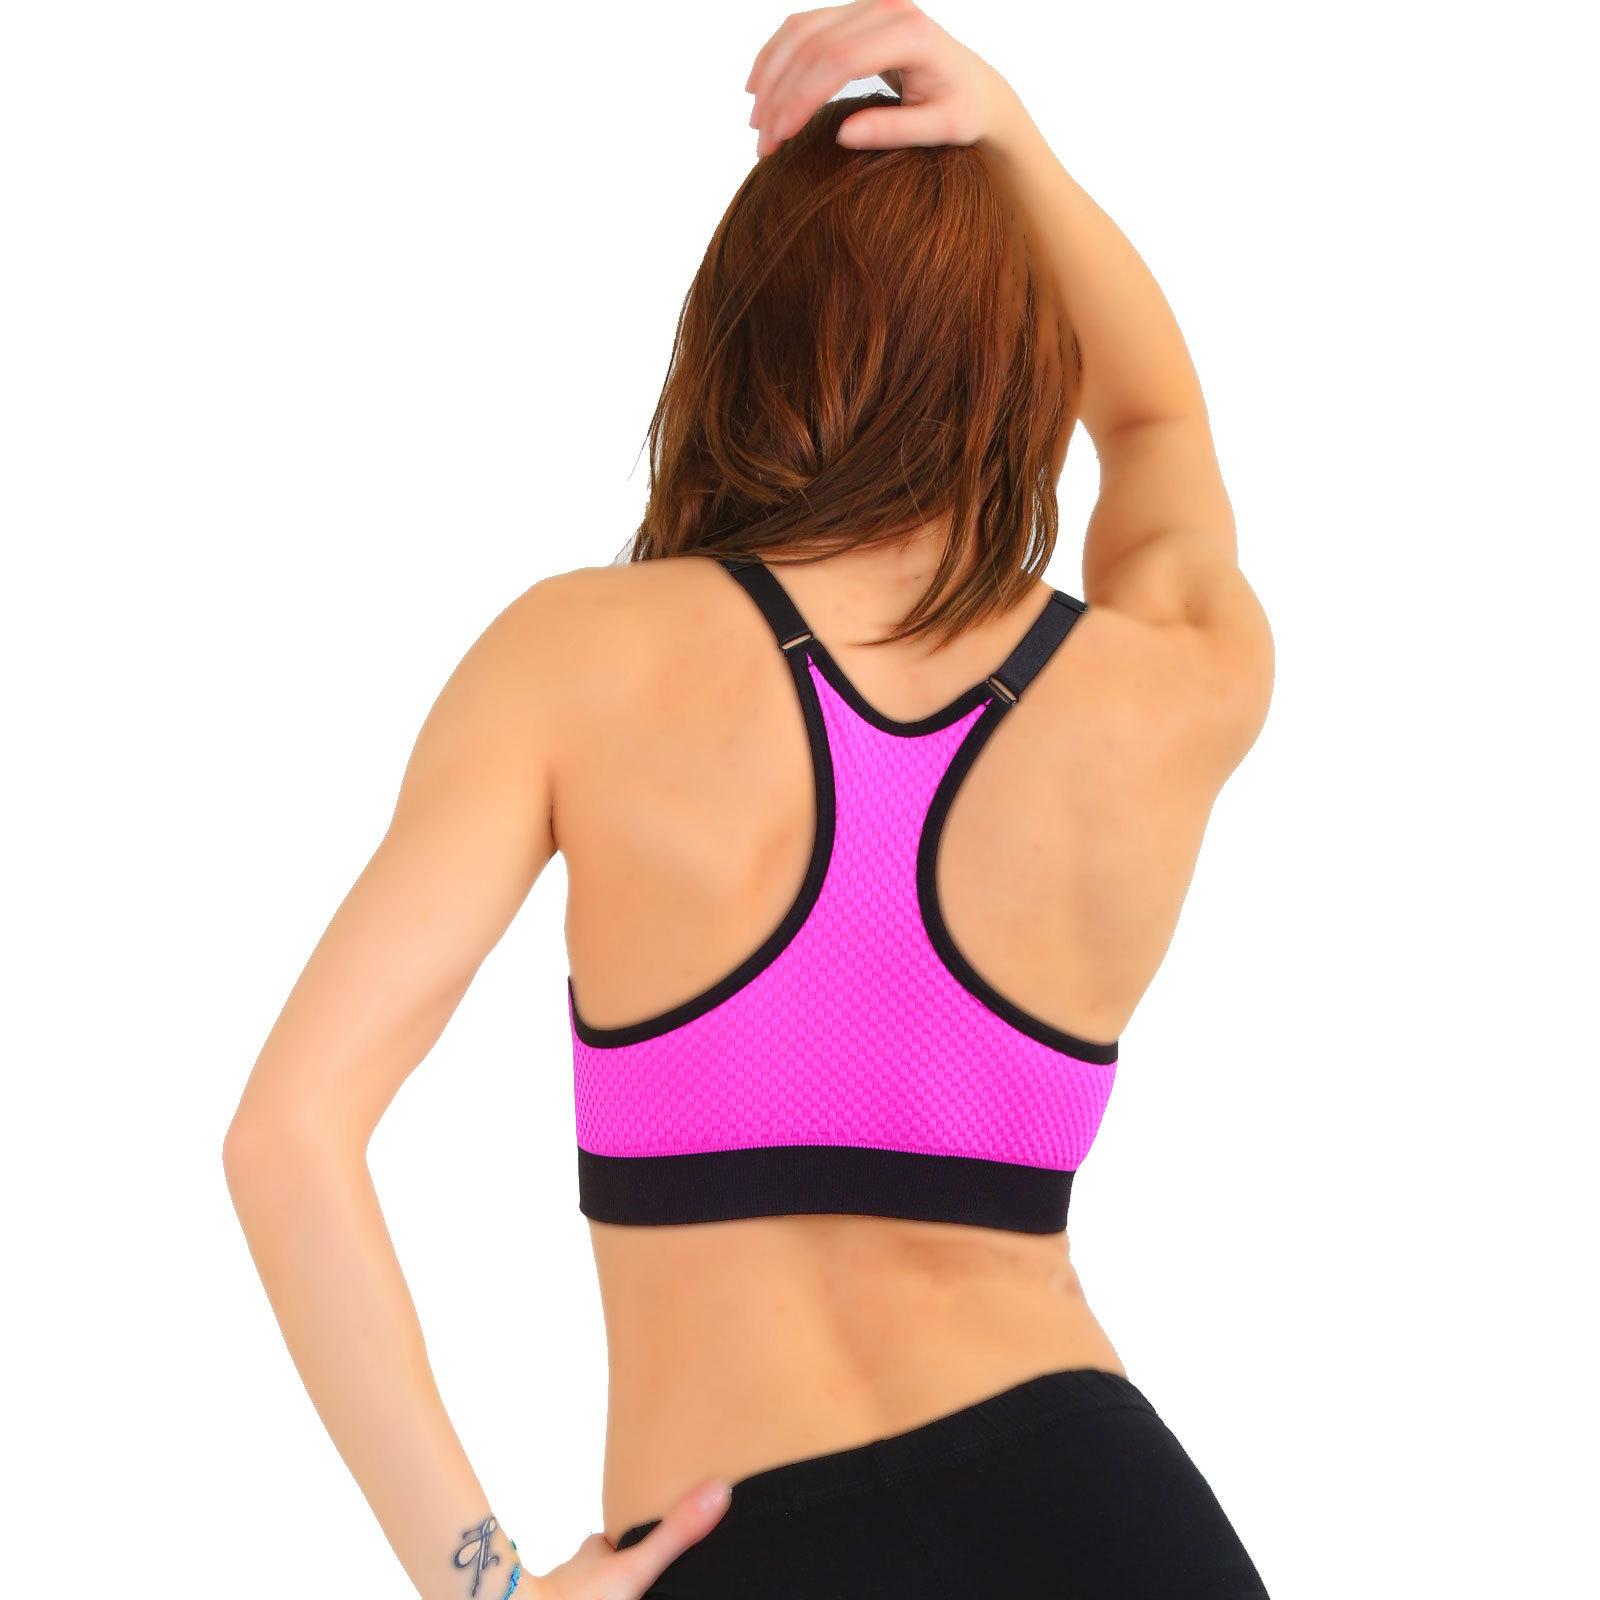 hot sport bh neon pink gelb blau violett orange sport. Black Bedroom Furniture Sets. Home Design Ideas